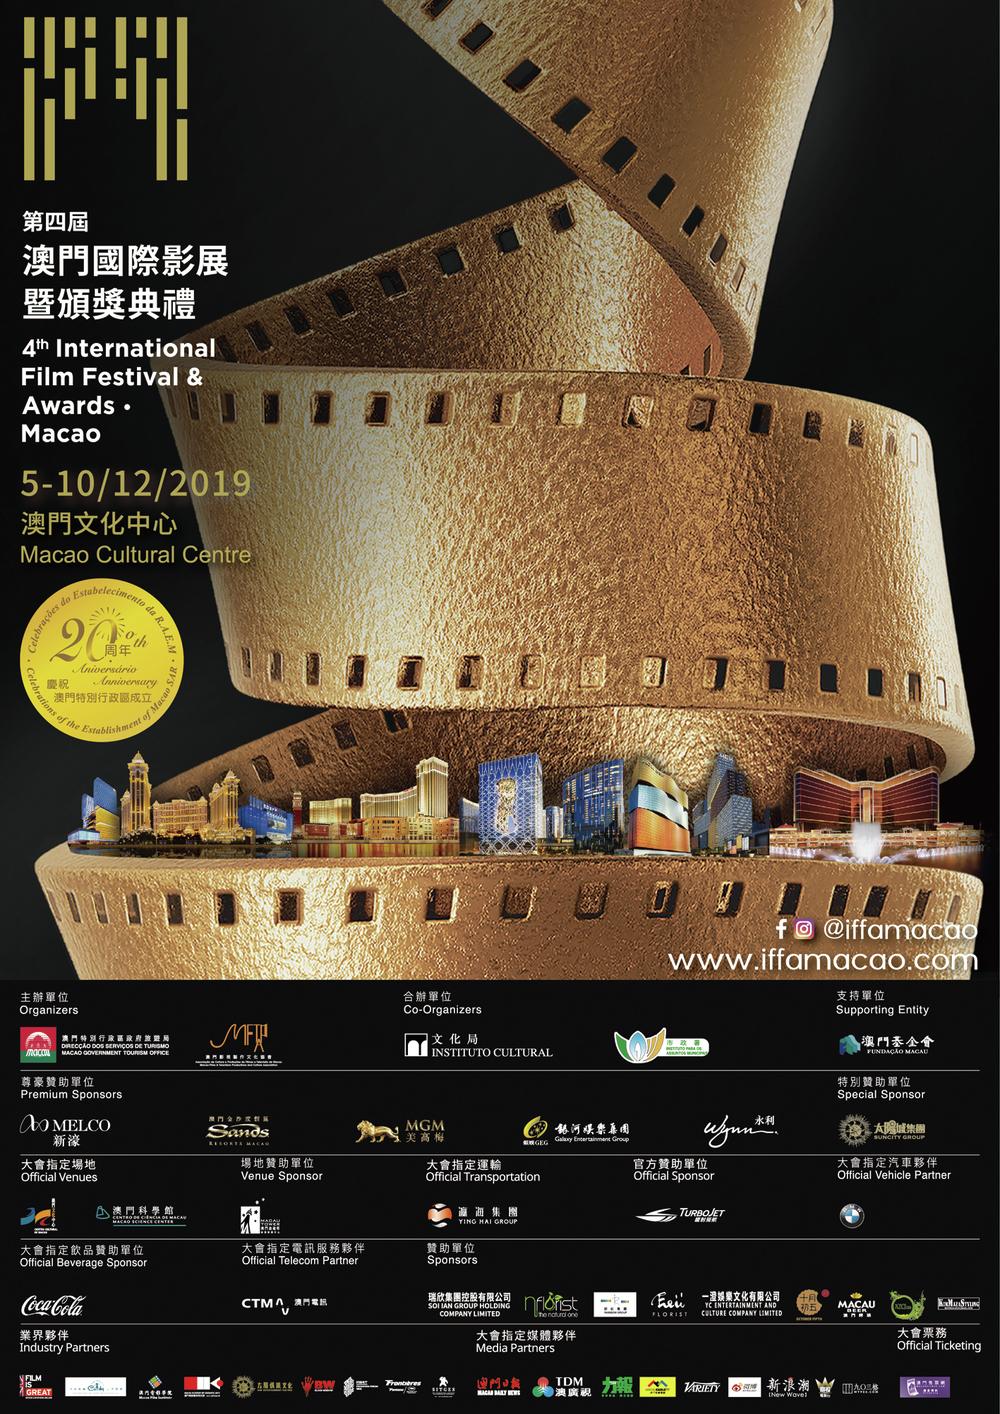 http://www.thestandard.com.hk/section-news/fc/12/213369/Let-the-festivities-commence